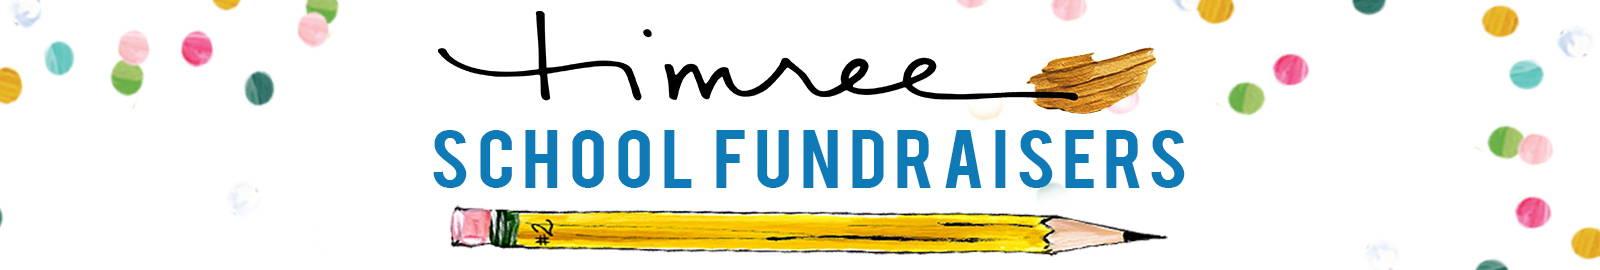 Timree School Fundraiser